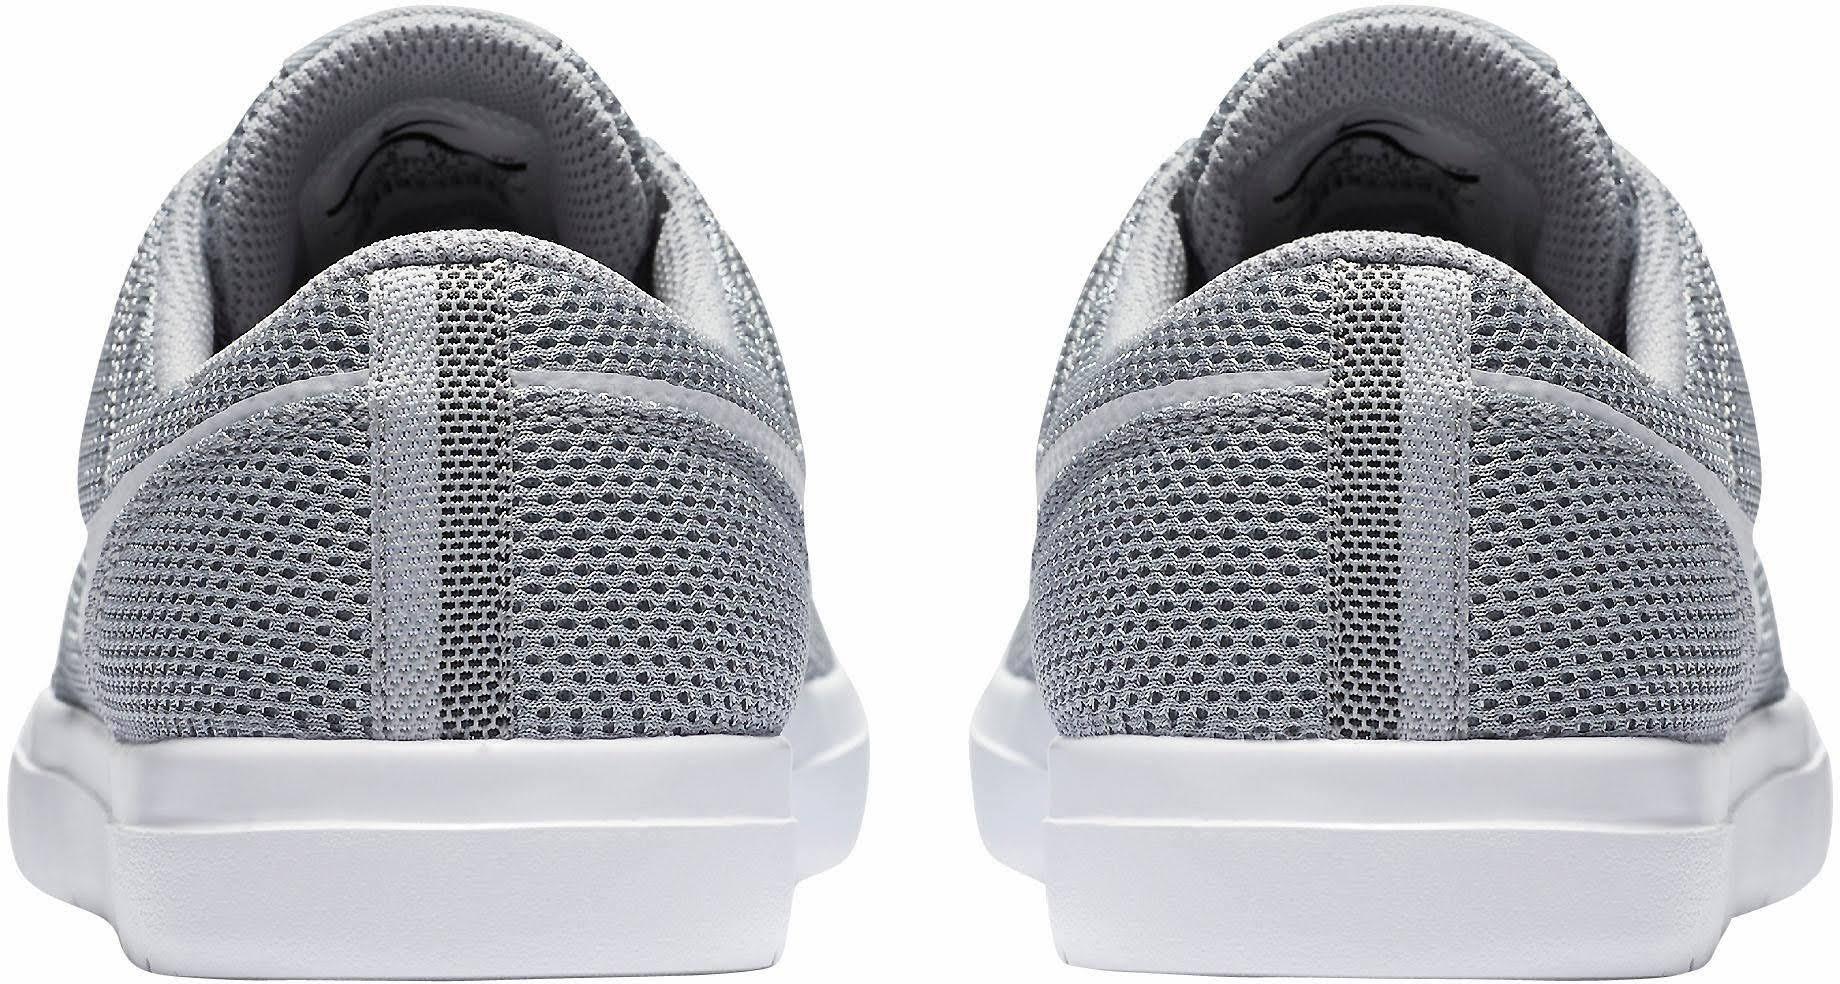 schwarz Größe Sb 40 Ii Ultralight Blau 880271 Nike Portmore weiß 011 5 TxfwqqvH